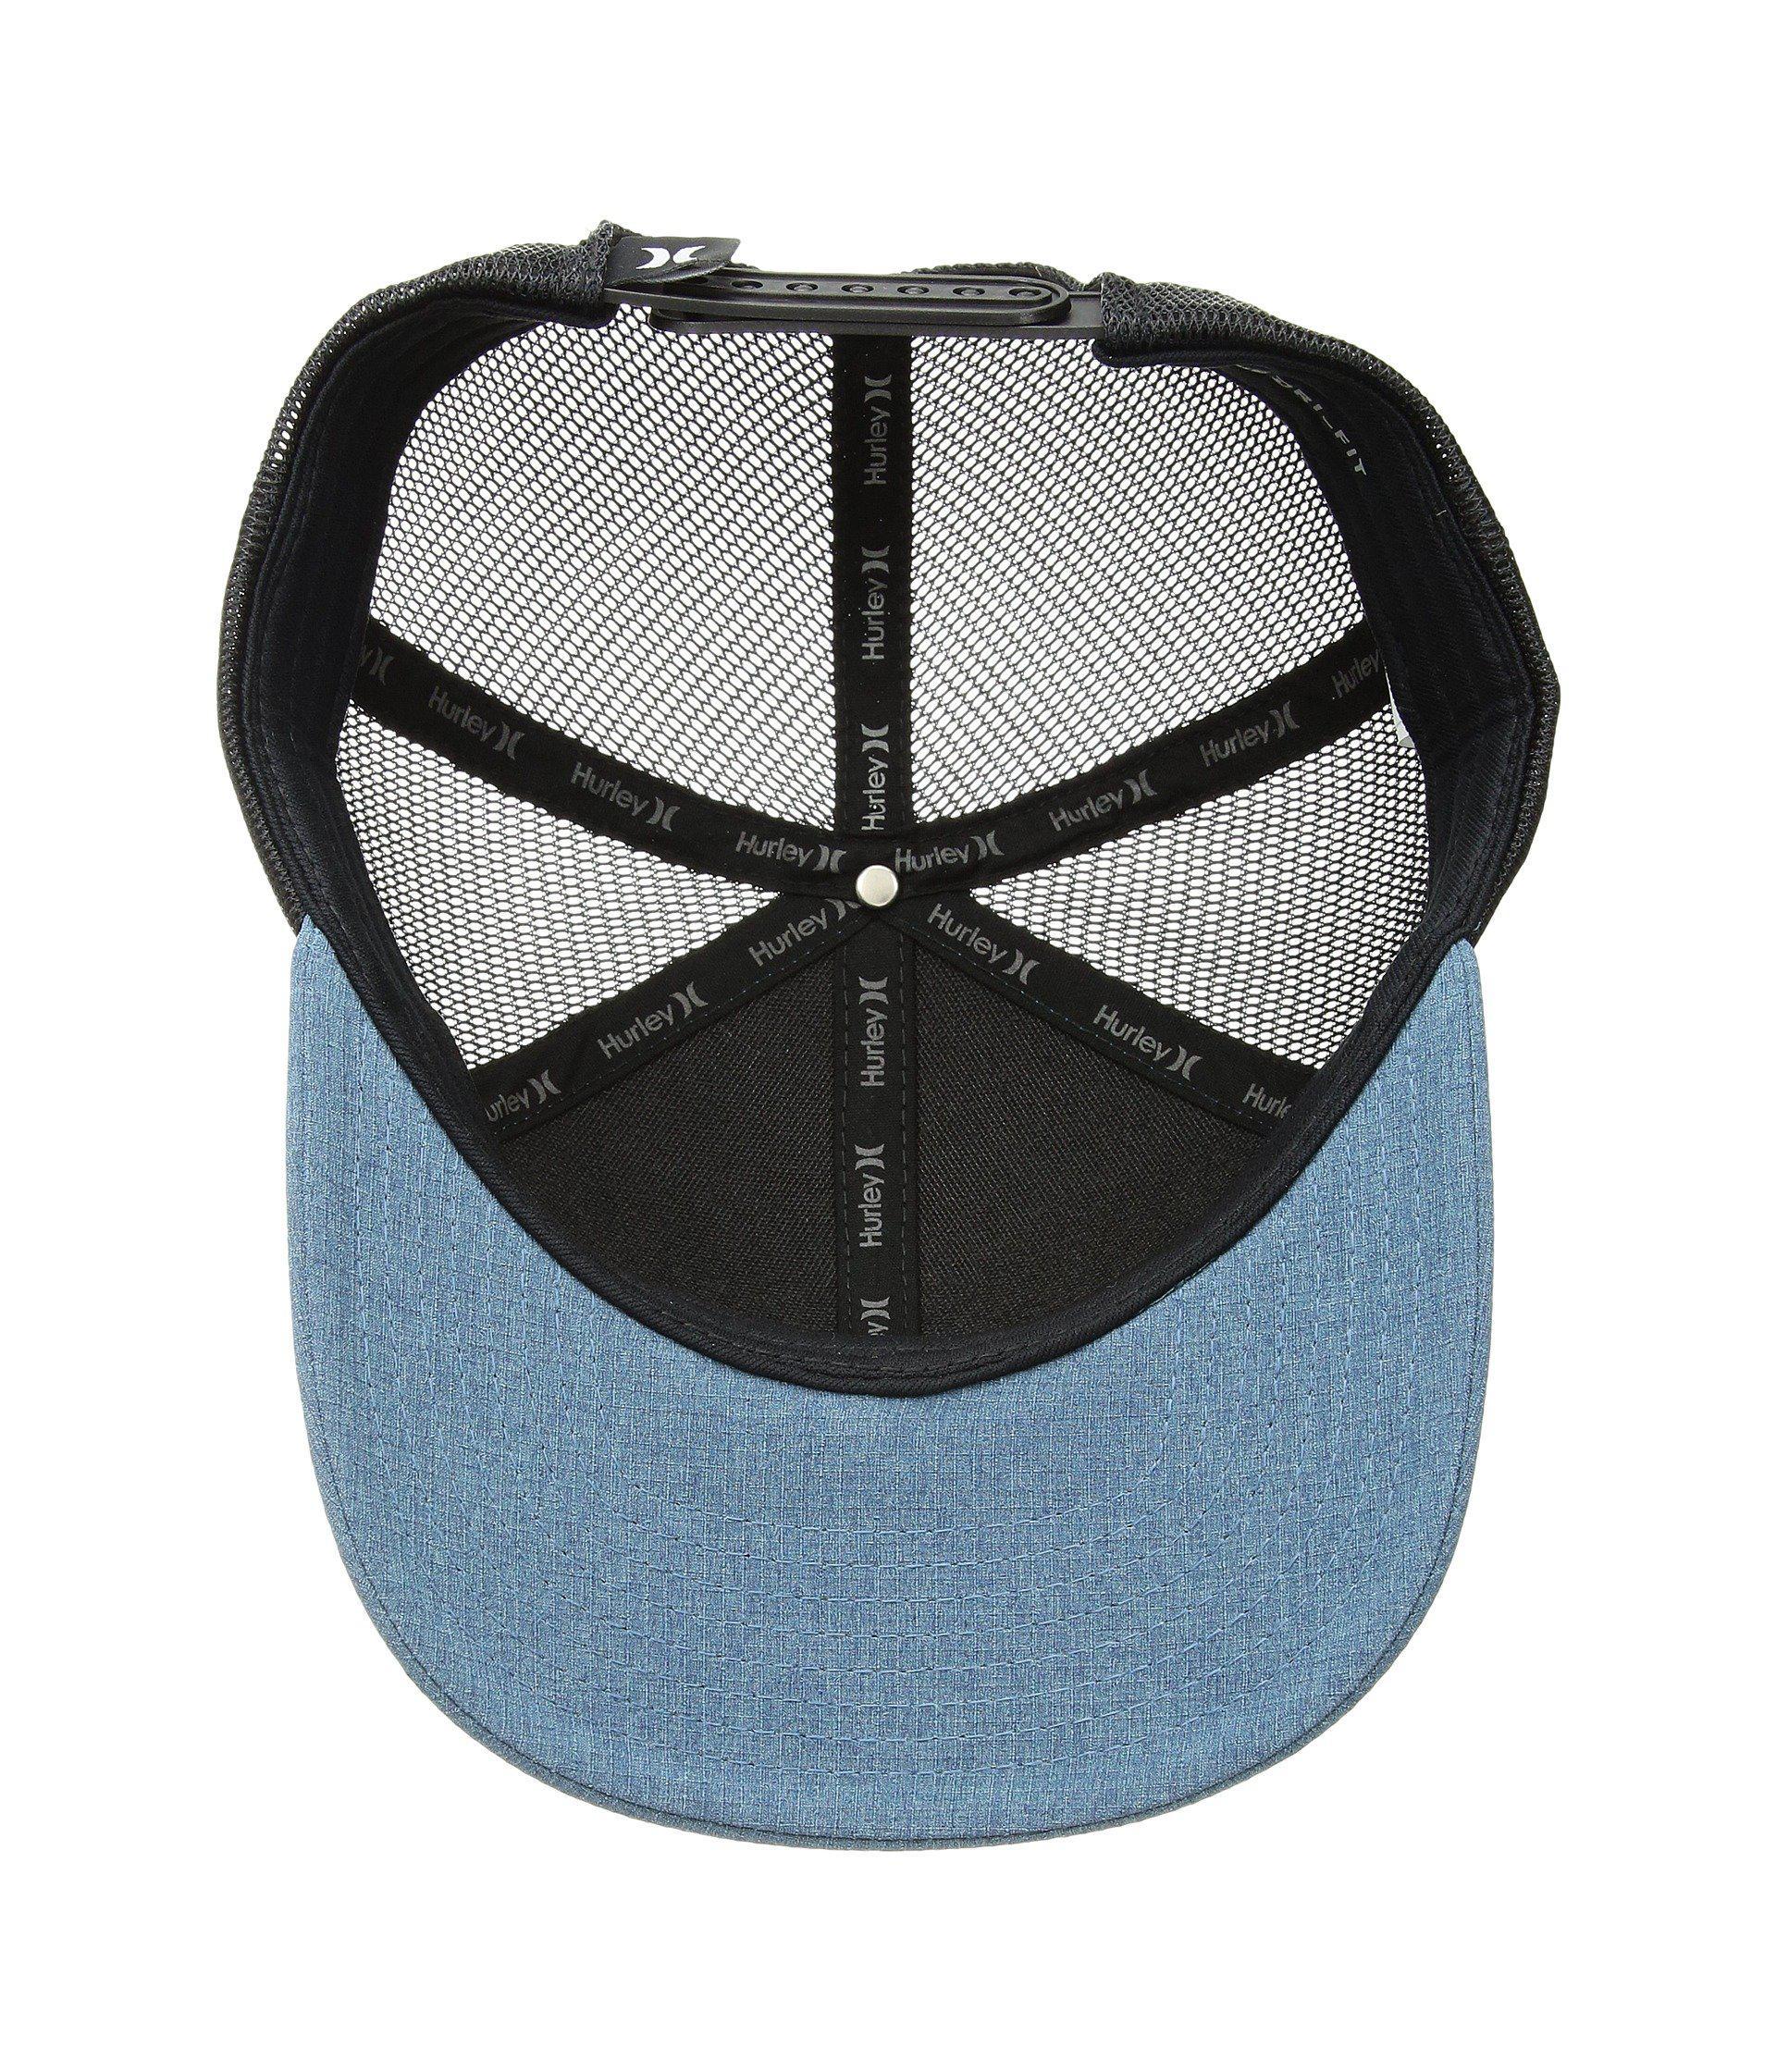 88d0b9f683aae ... get lyst hurley swell trucker hat black caps for men f30cd 46298